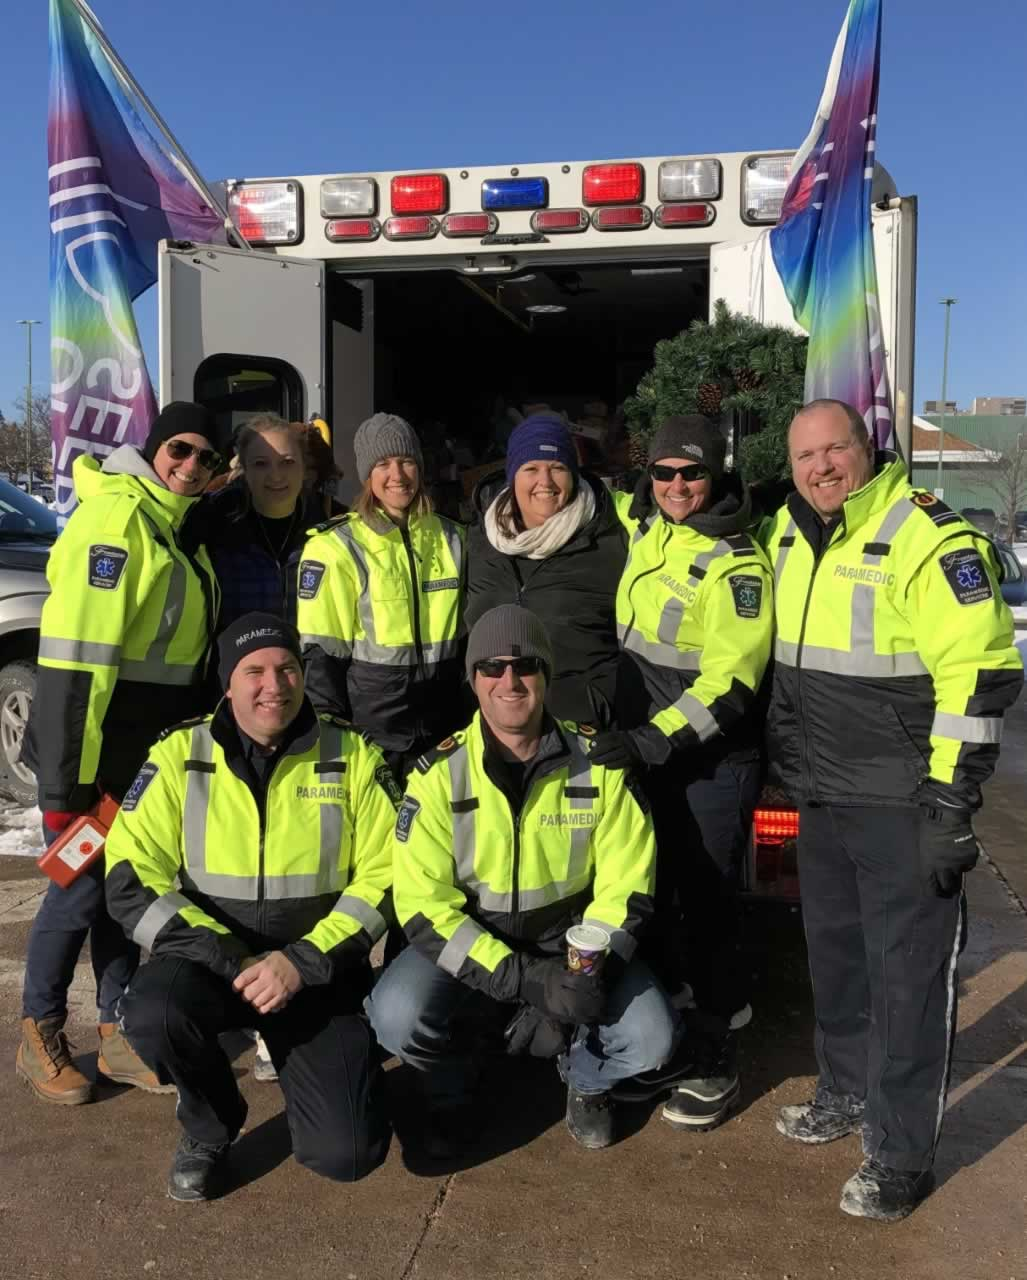 Group Photo of Local 462 Ambulance Communication Officers and Paramedics standing by ambulance